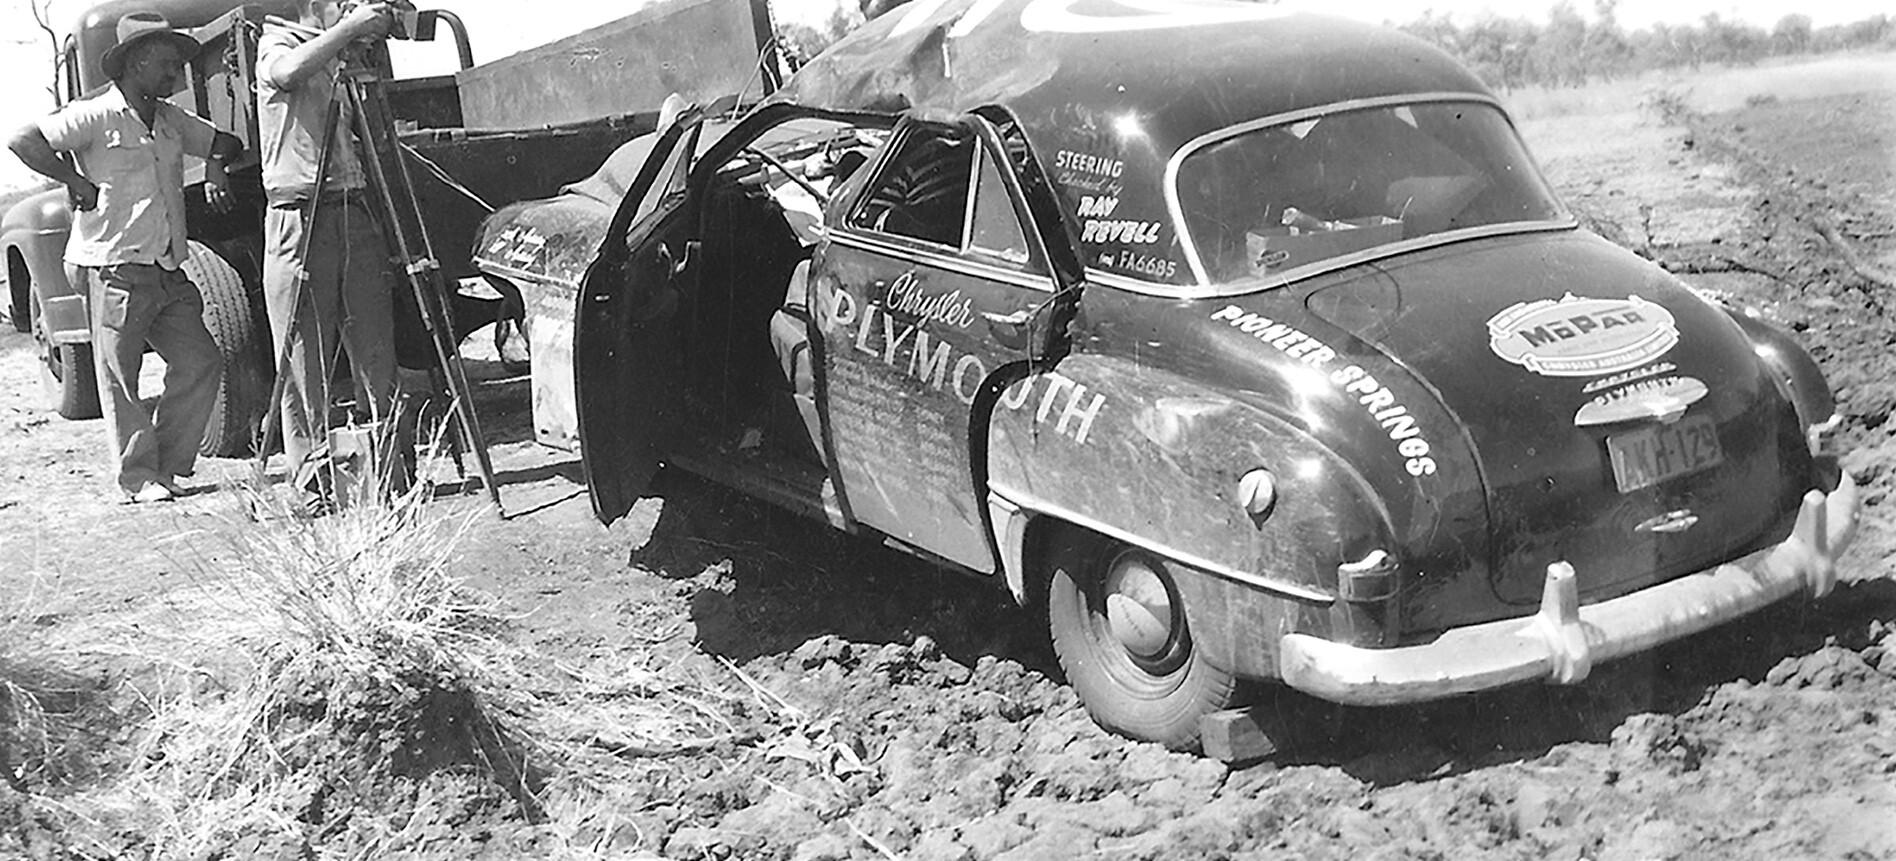 Jack Gelignite Rolled 1952 Chrysler Plymouth Jpg